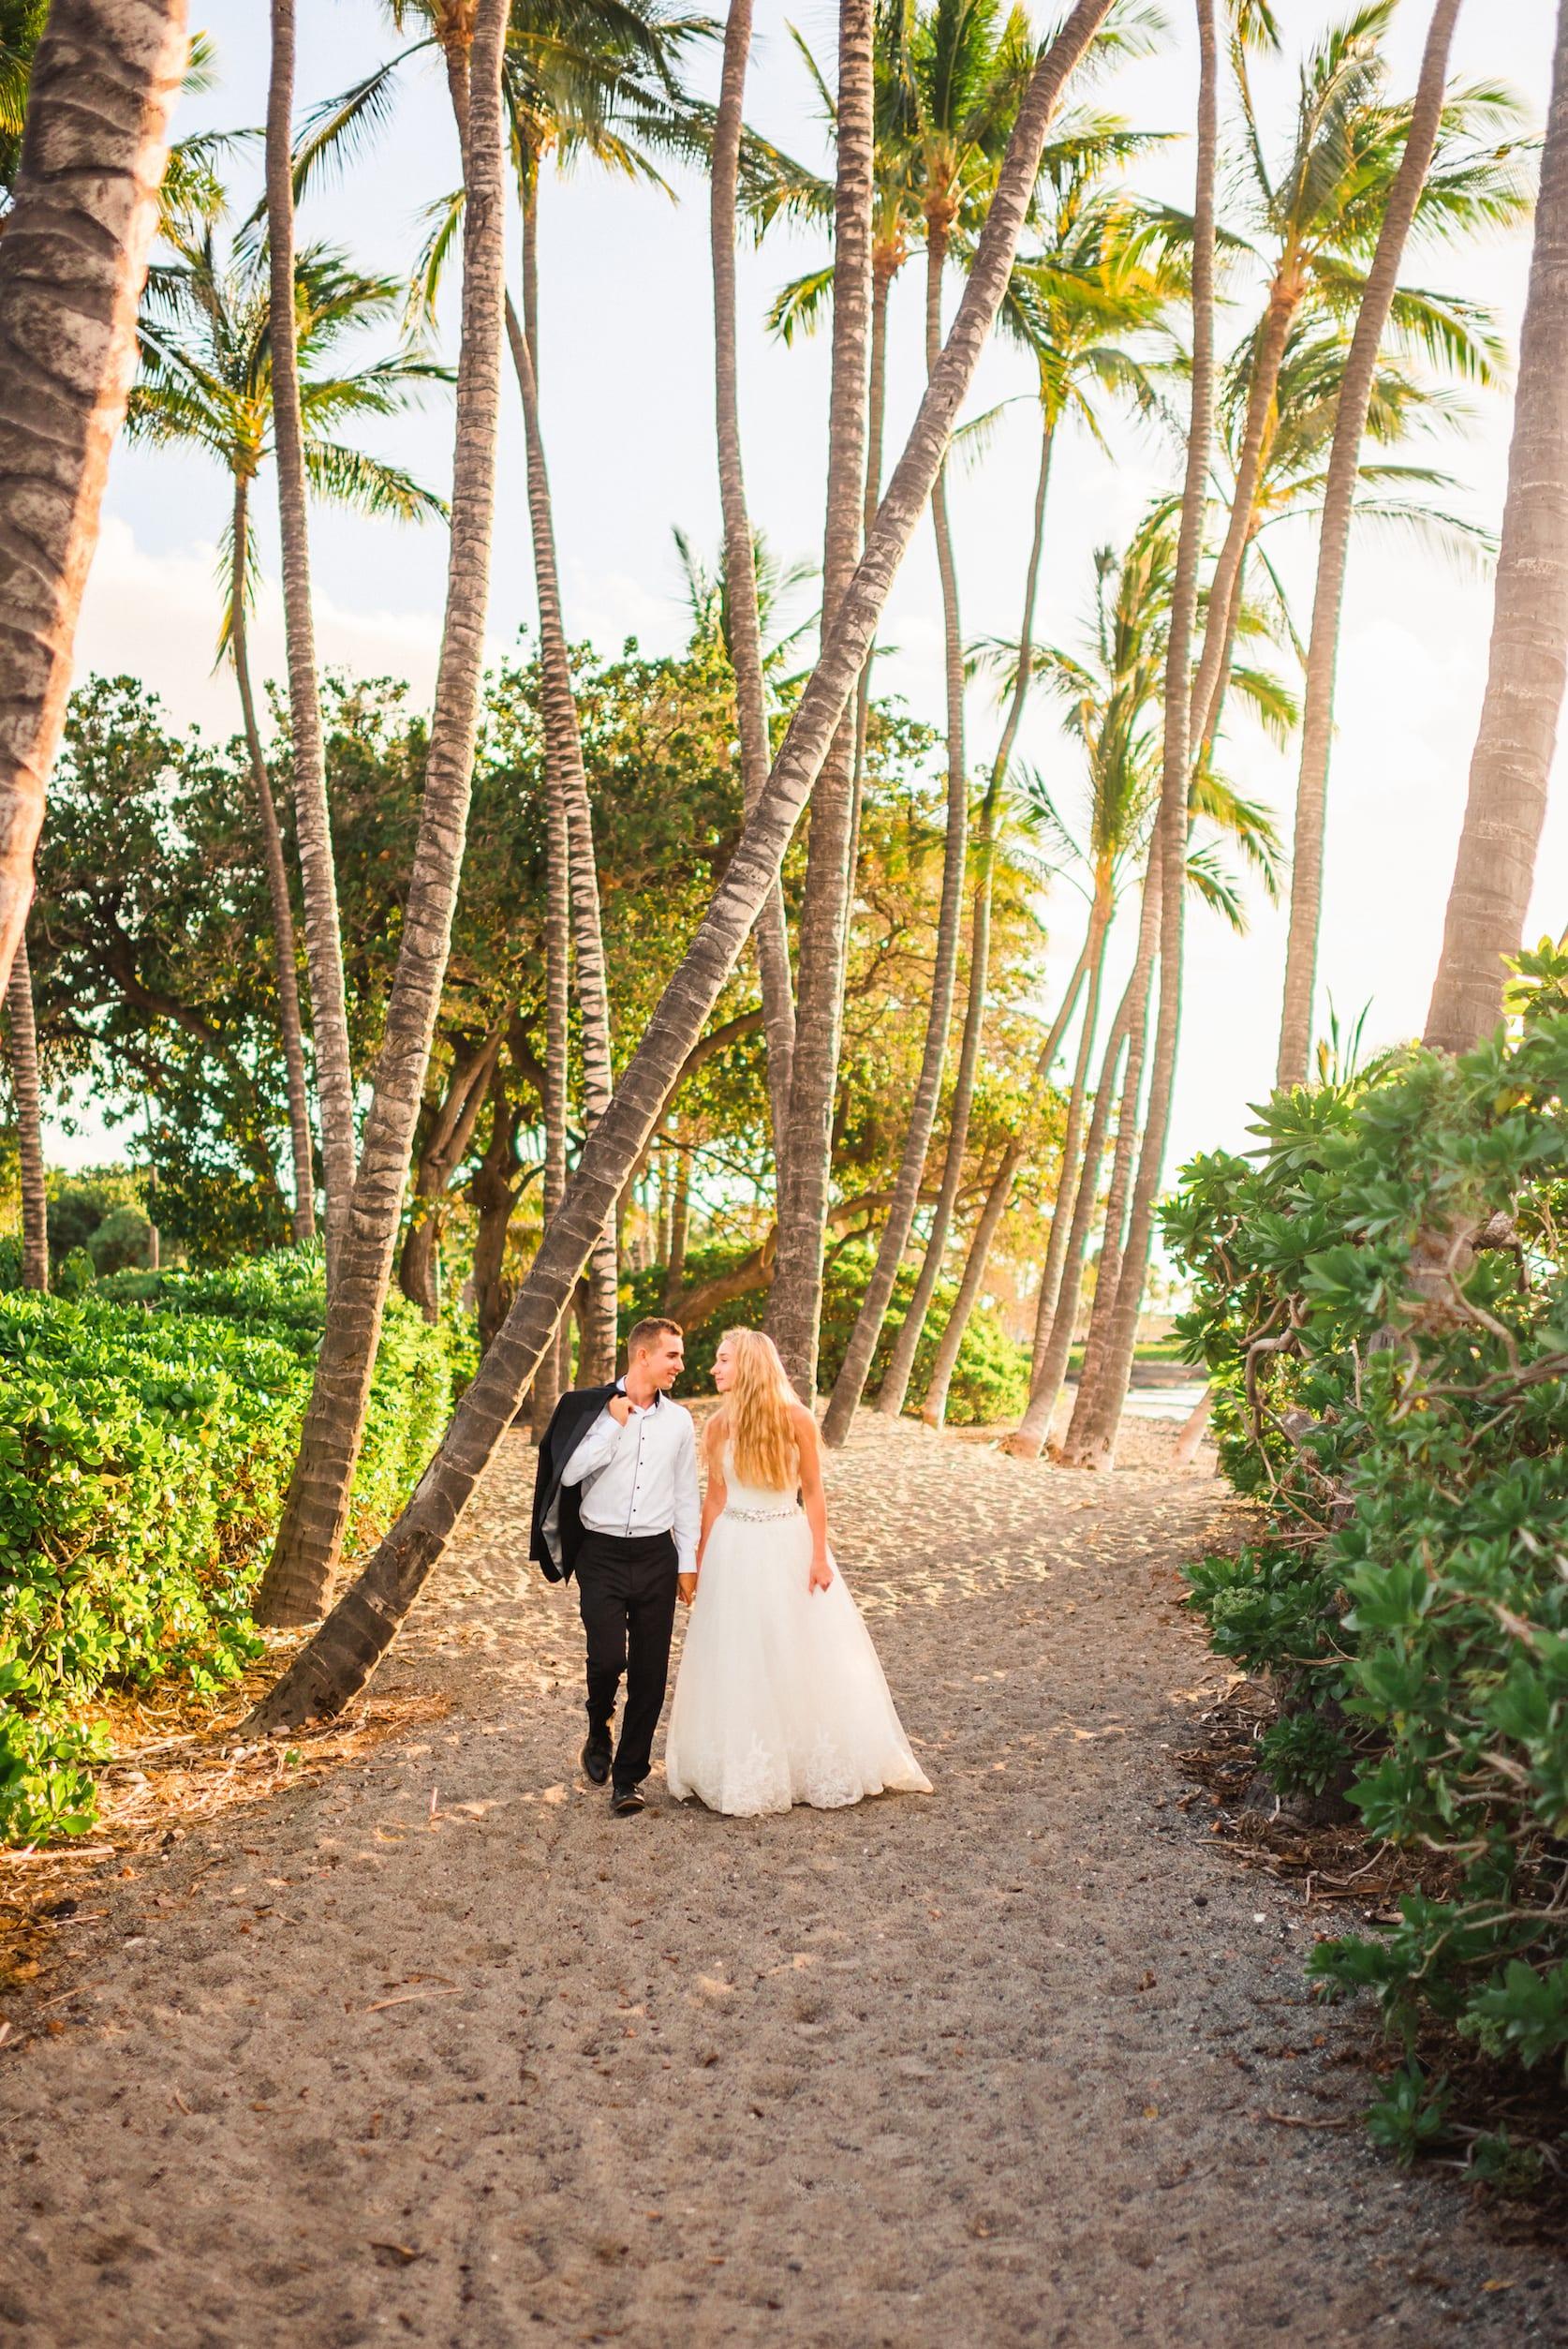 Big-Island-Elopement-Private-Wedding-Hawaii-Beach-02.jpg